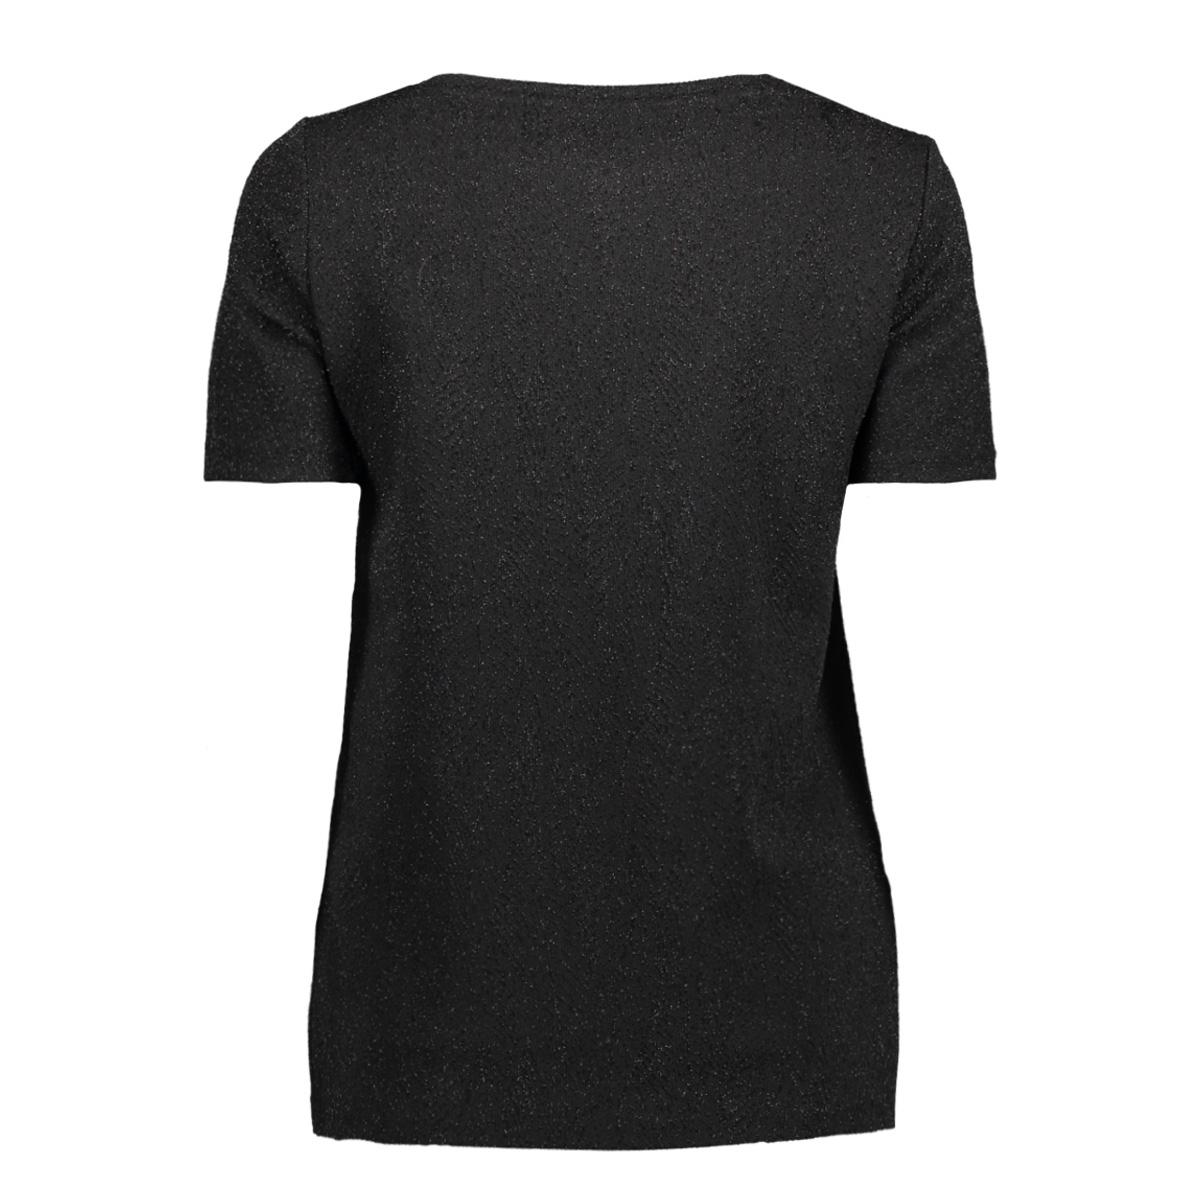 vmbright ss top boo 10188424 vero moda t-shirt black/black lure